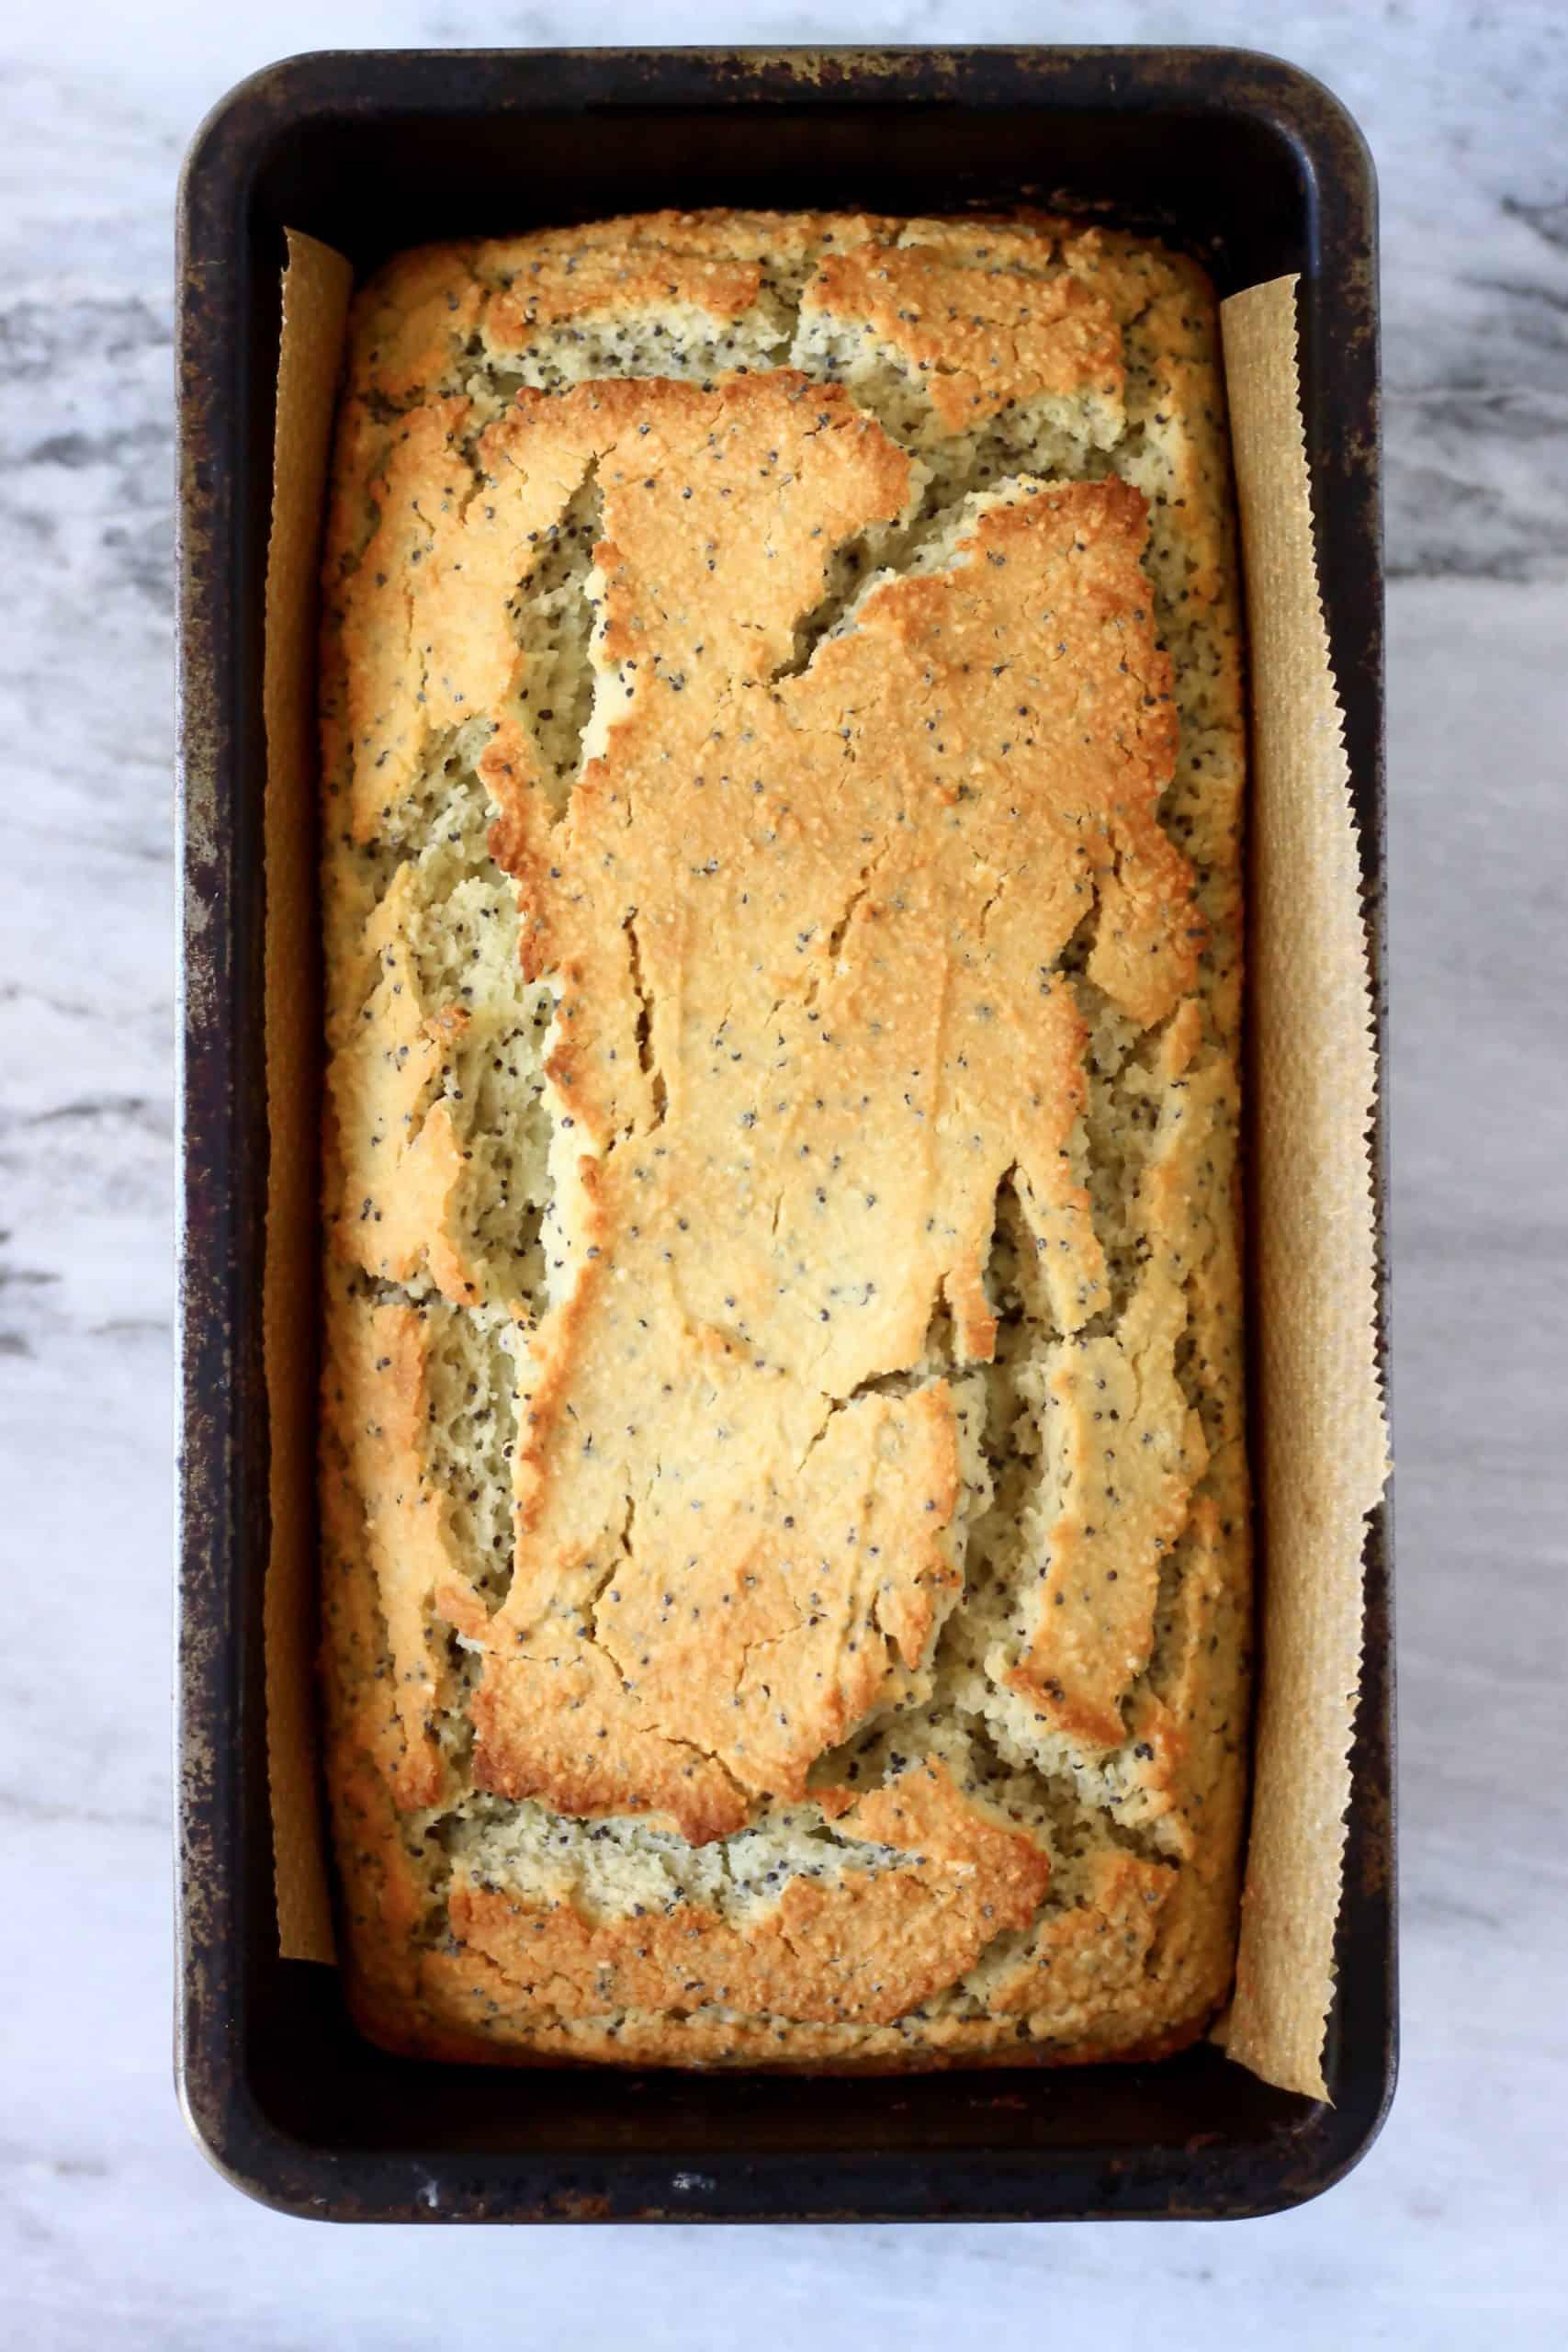 A loaf of gluten-free vegan lemon poppy seed bread in a loaf tin